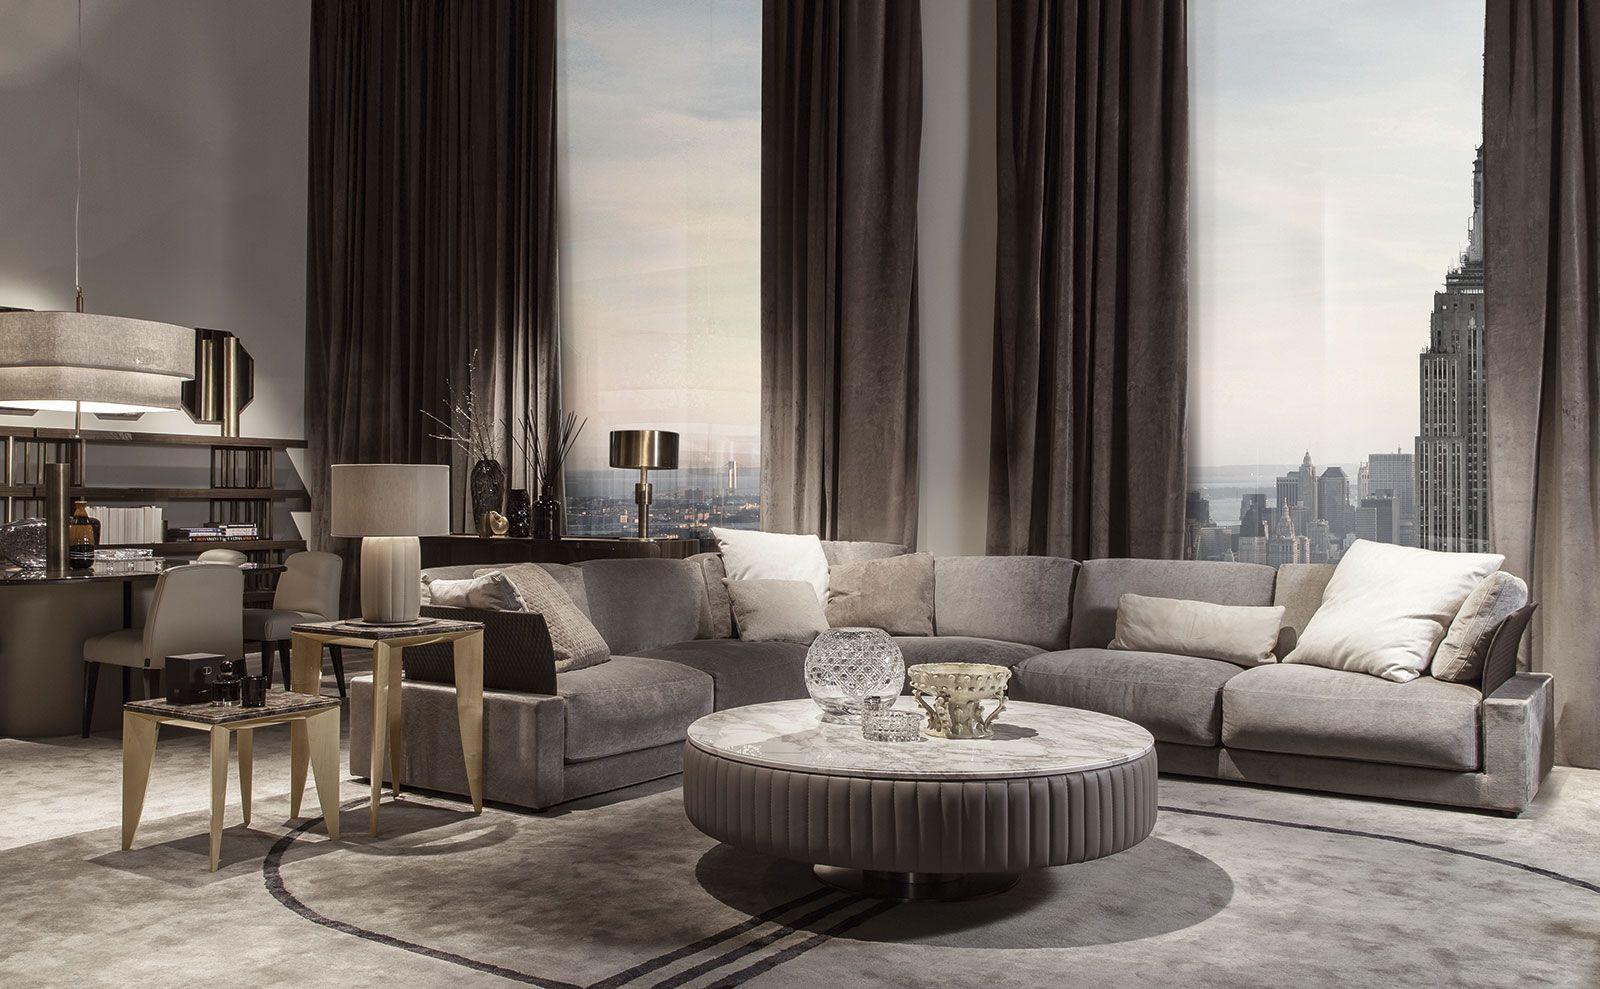 Célèbre Arredamento Living. Stunning Arredamento Hotel Hyatt Design  QP16